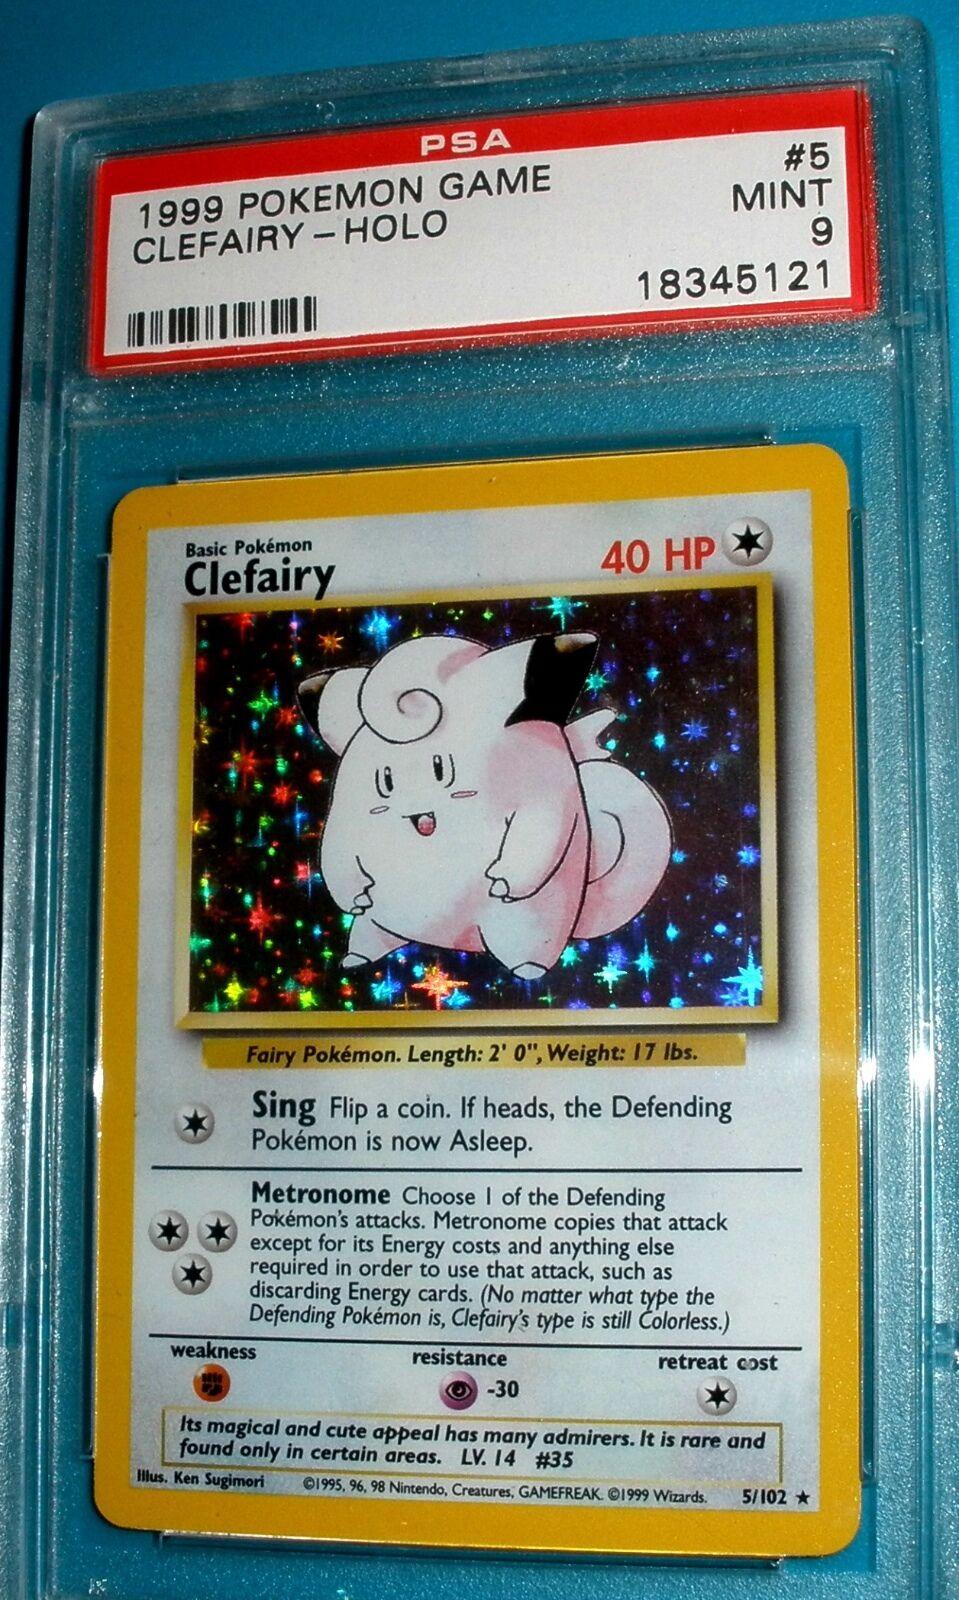 Pokémon - basis clefairy holo - psa - 9.